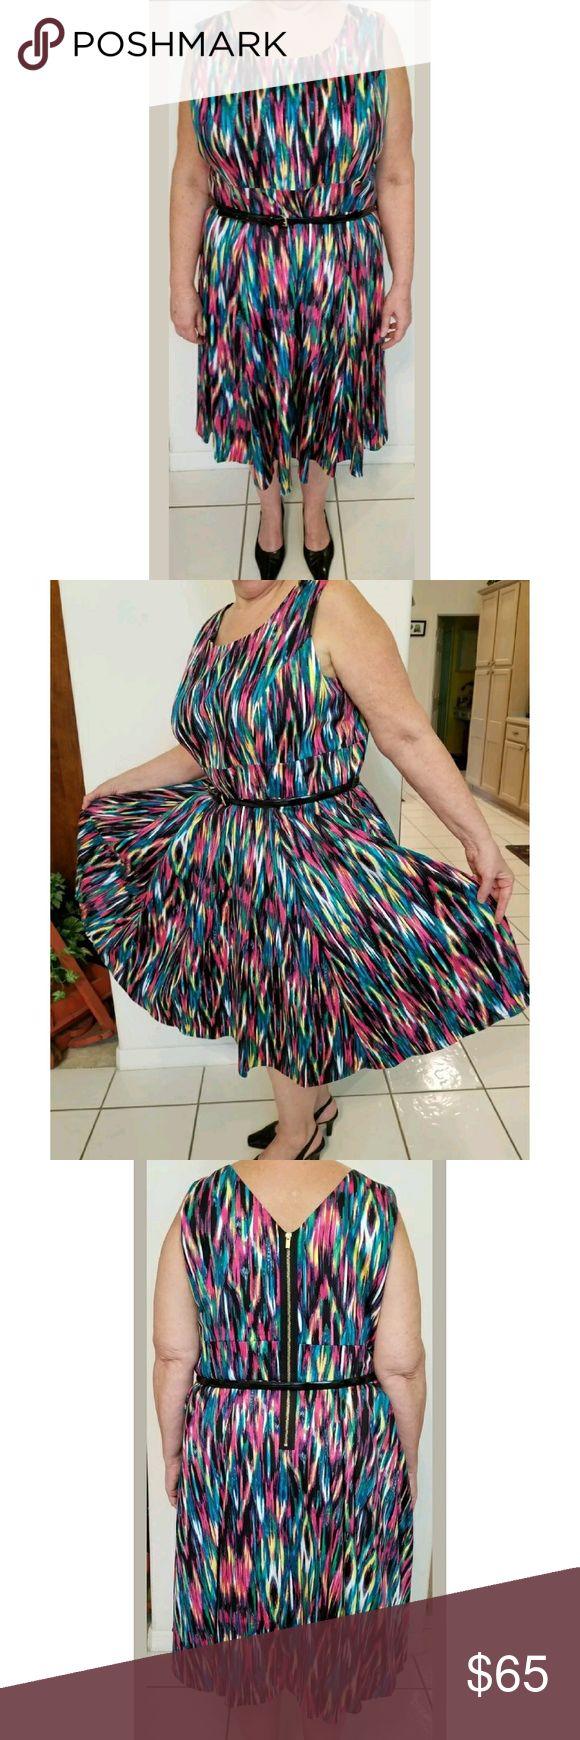 Calvin Klein Rainbow Dress Beautiful excellent condition size 20W dress Calvin Klein Dresses Maxi